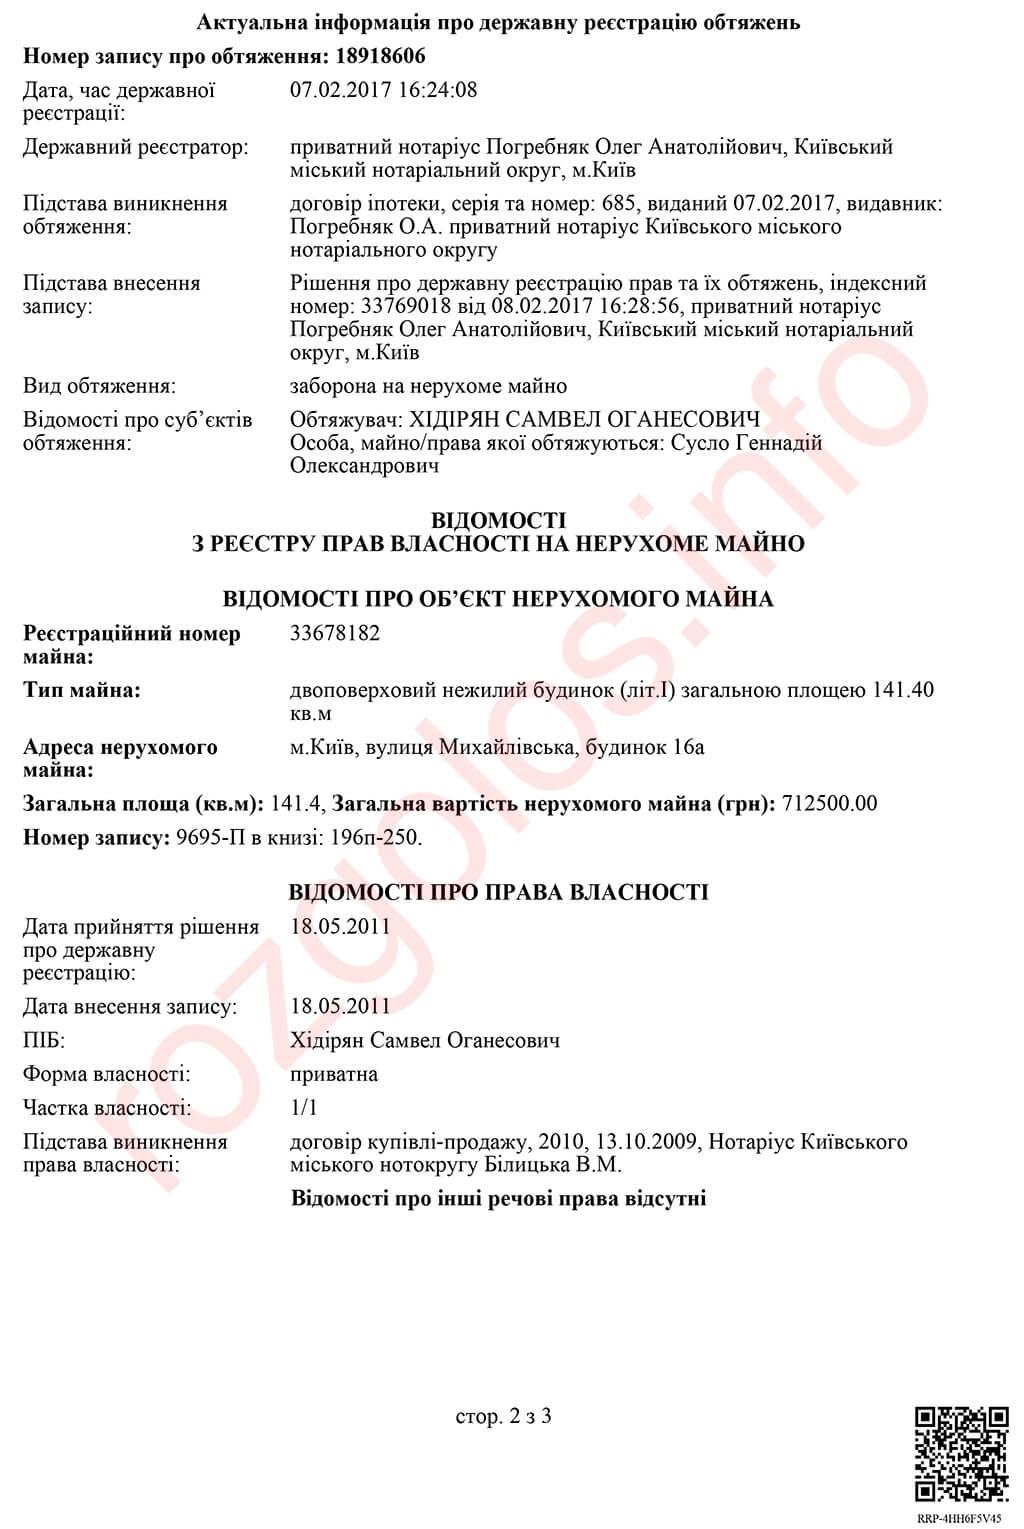 Хидирян Мисак и Алисименко Ольга